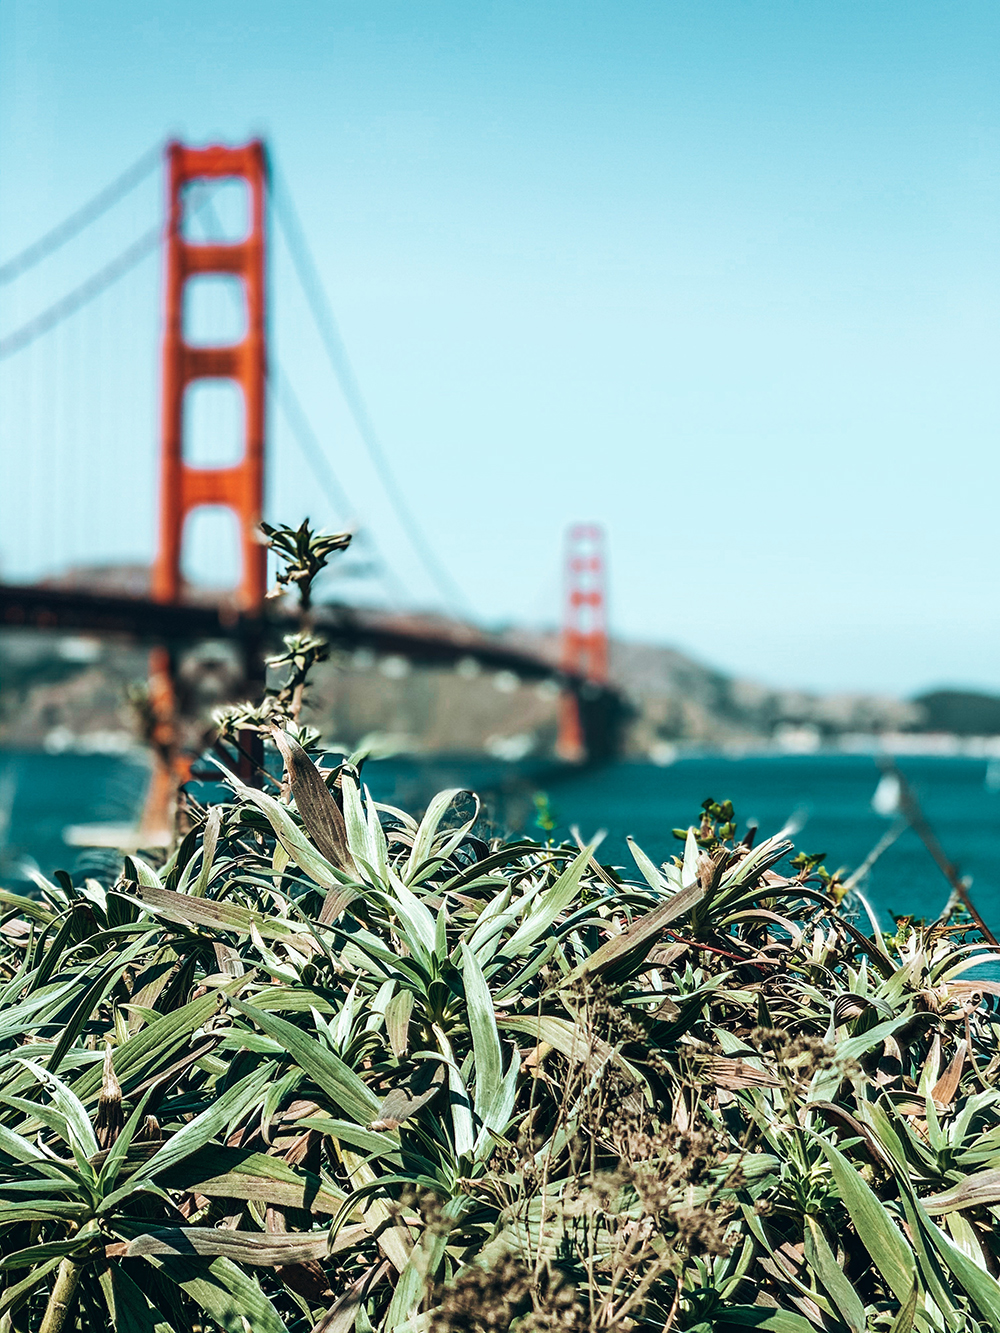 Golden Gate Bridge portrait